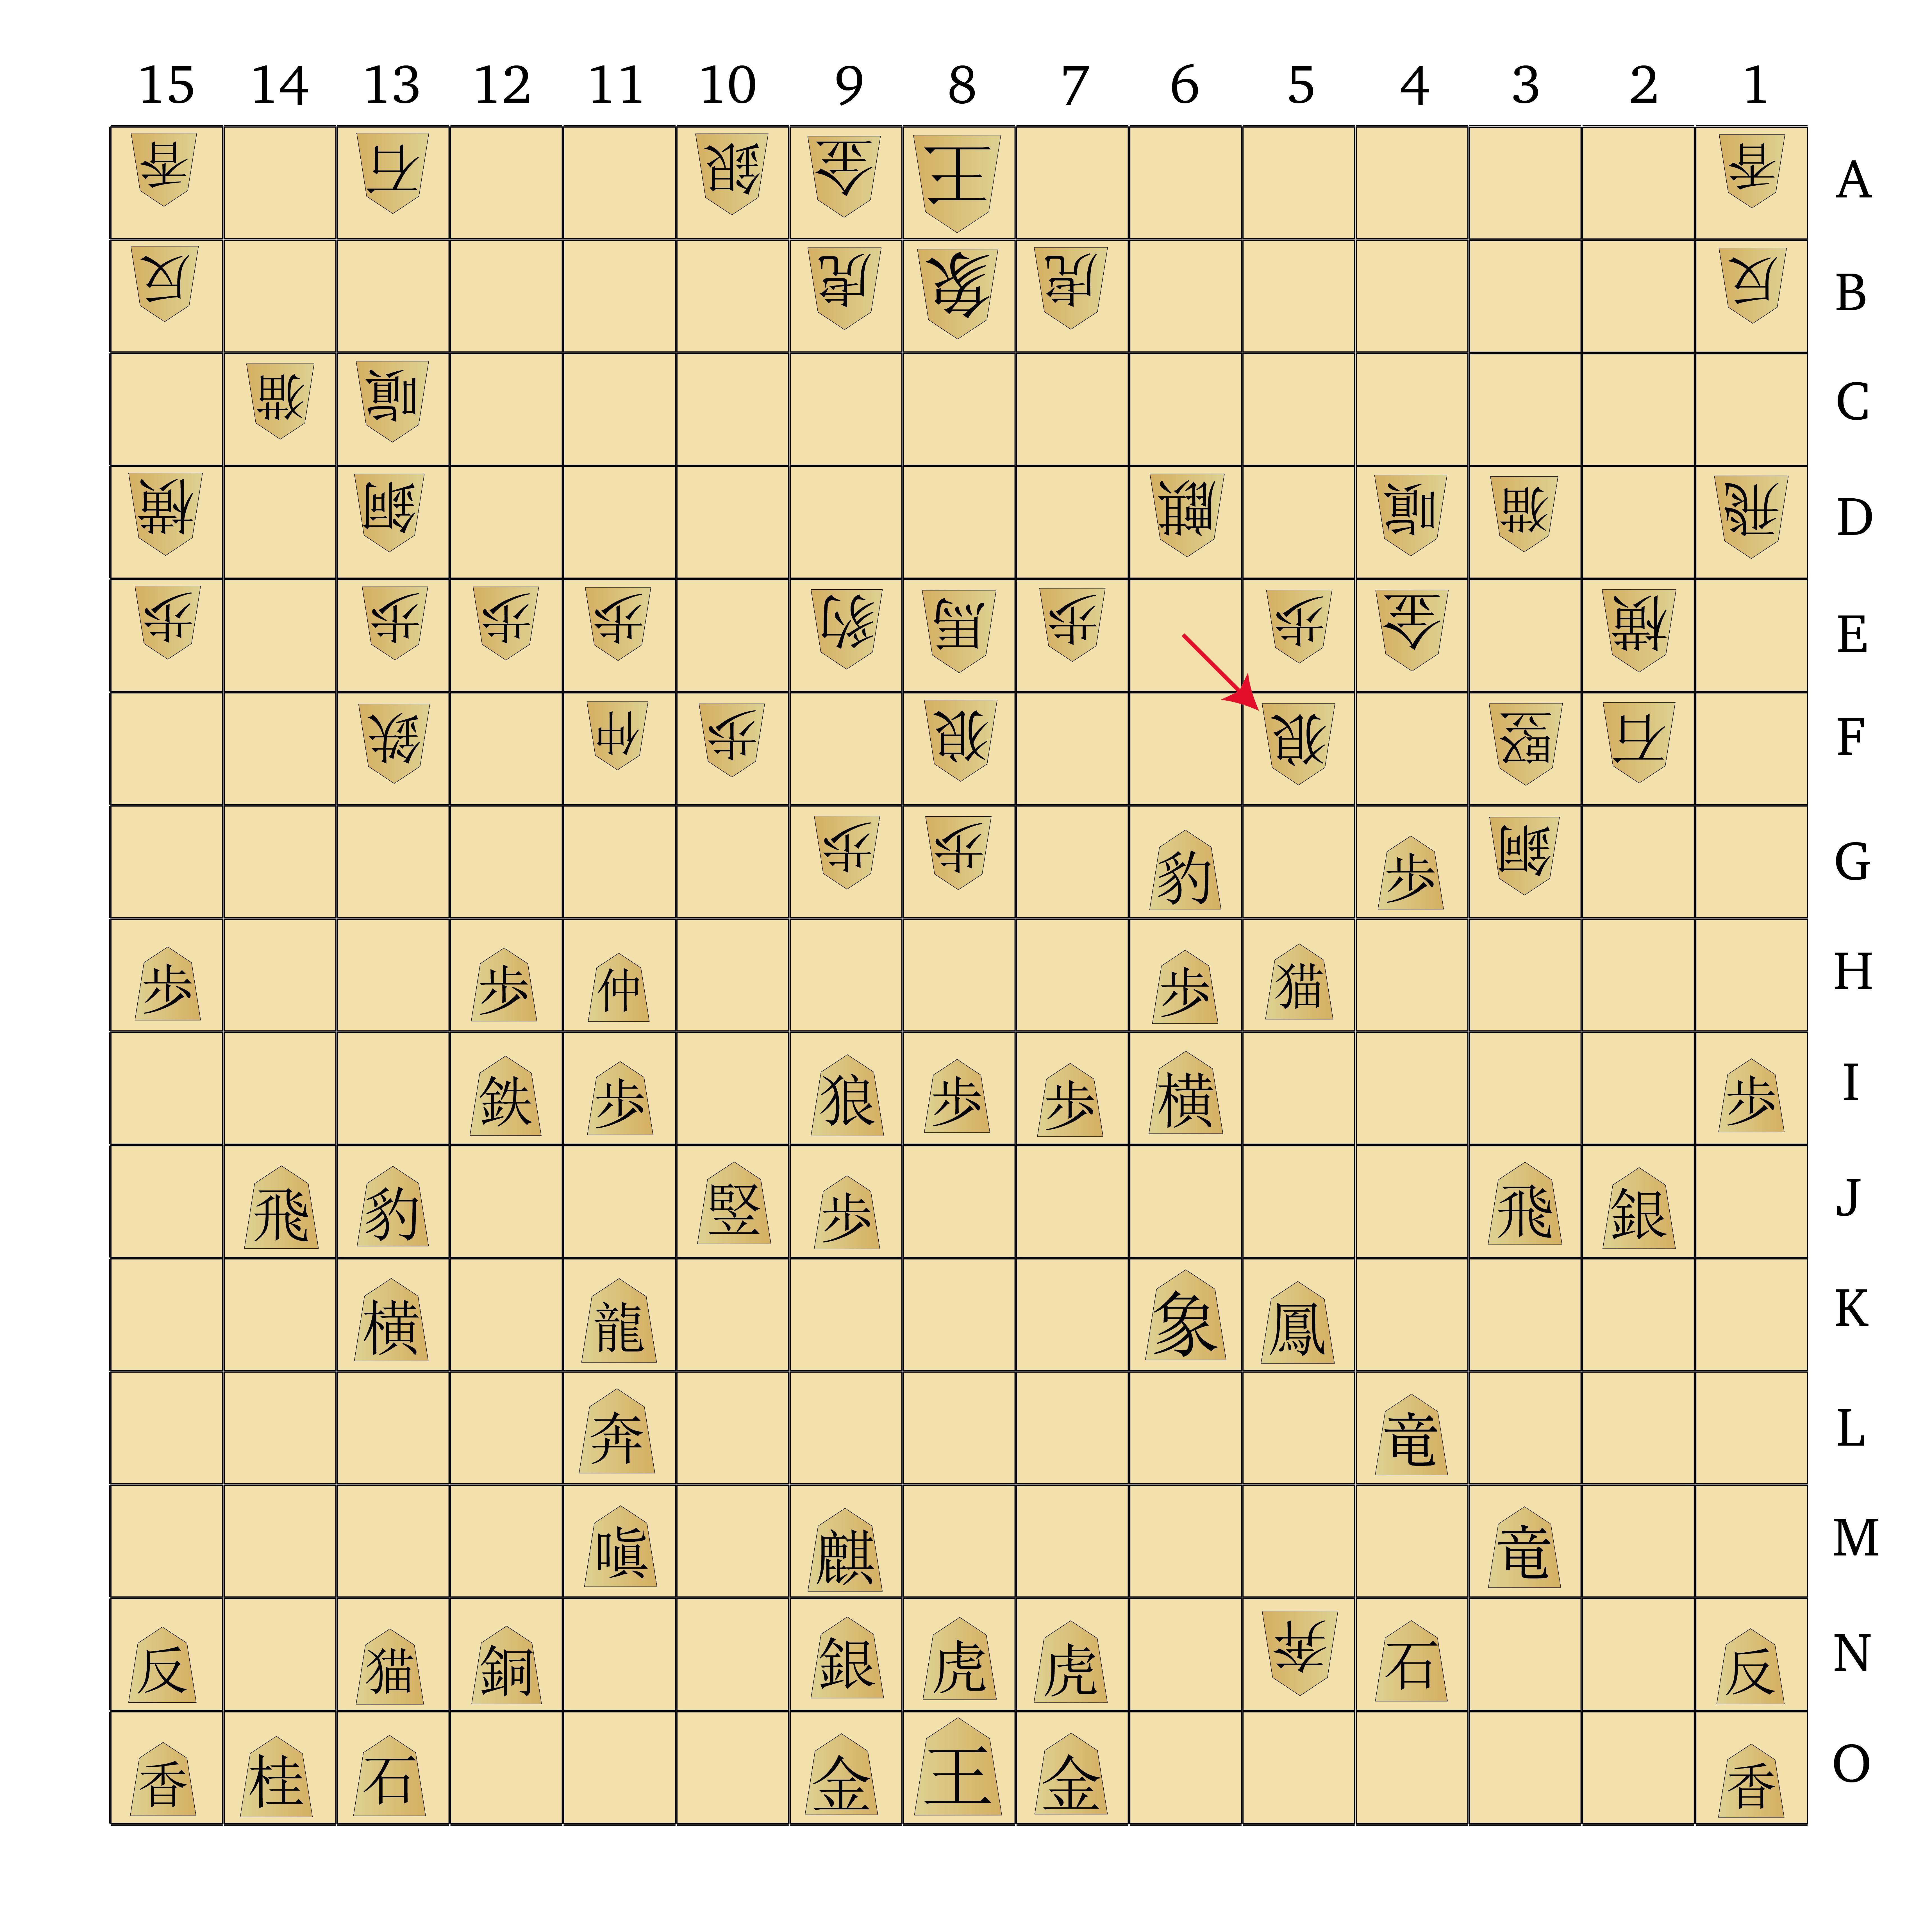 Dai Shogi 420 -- Move 320-01